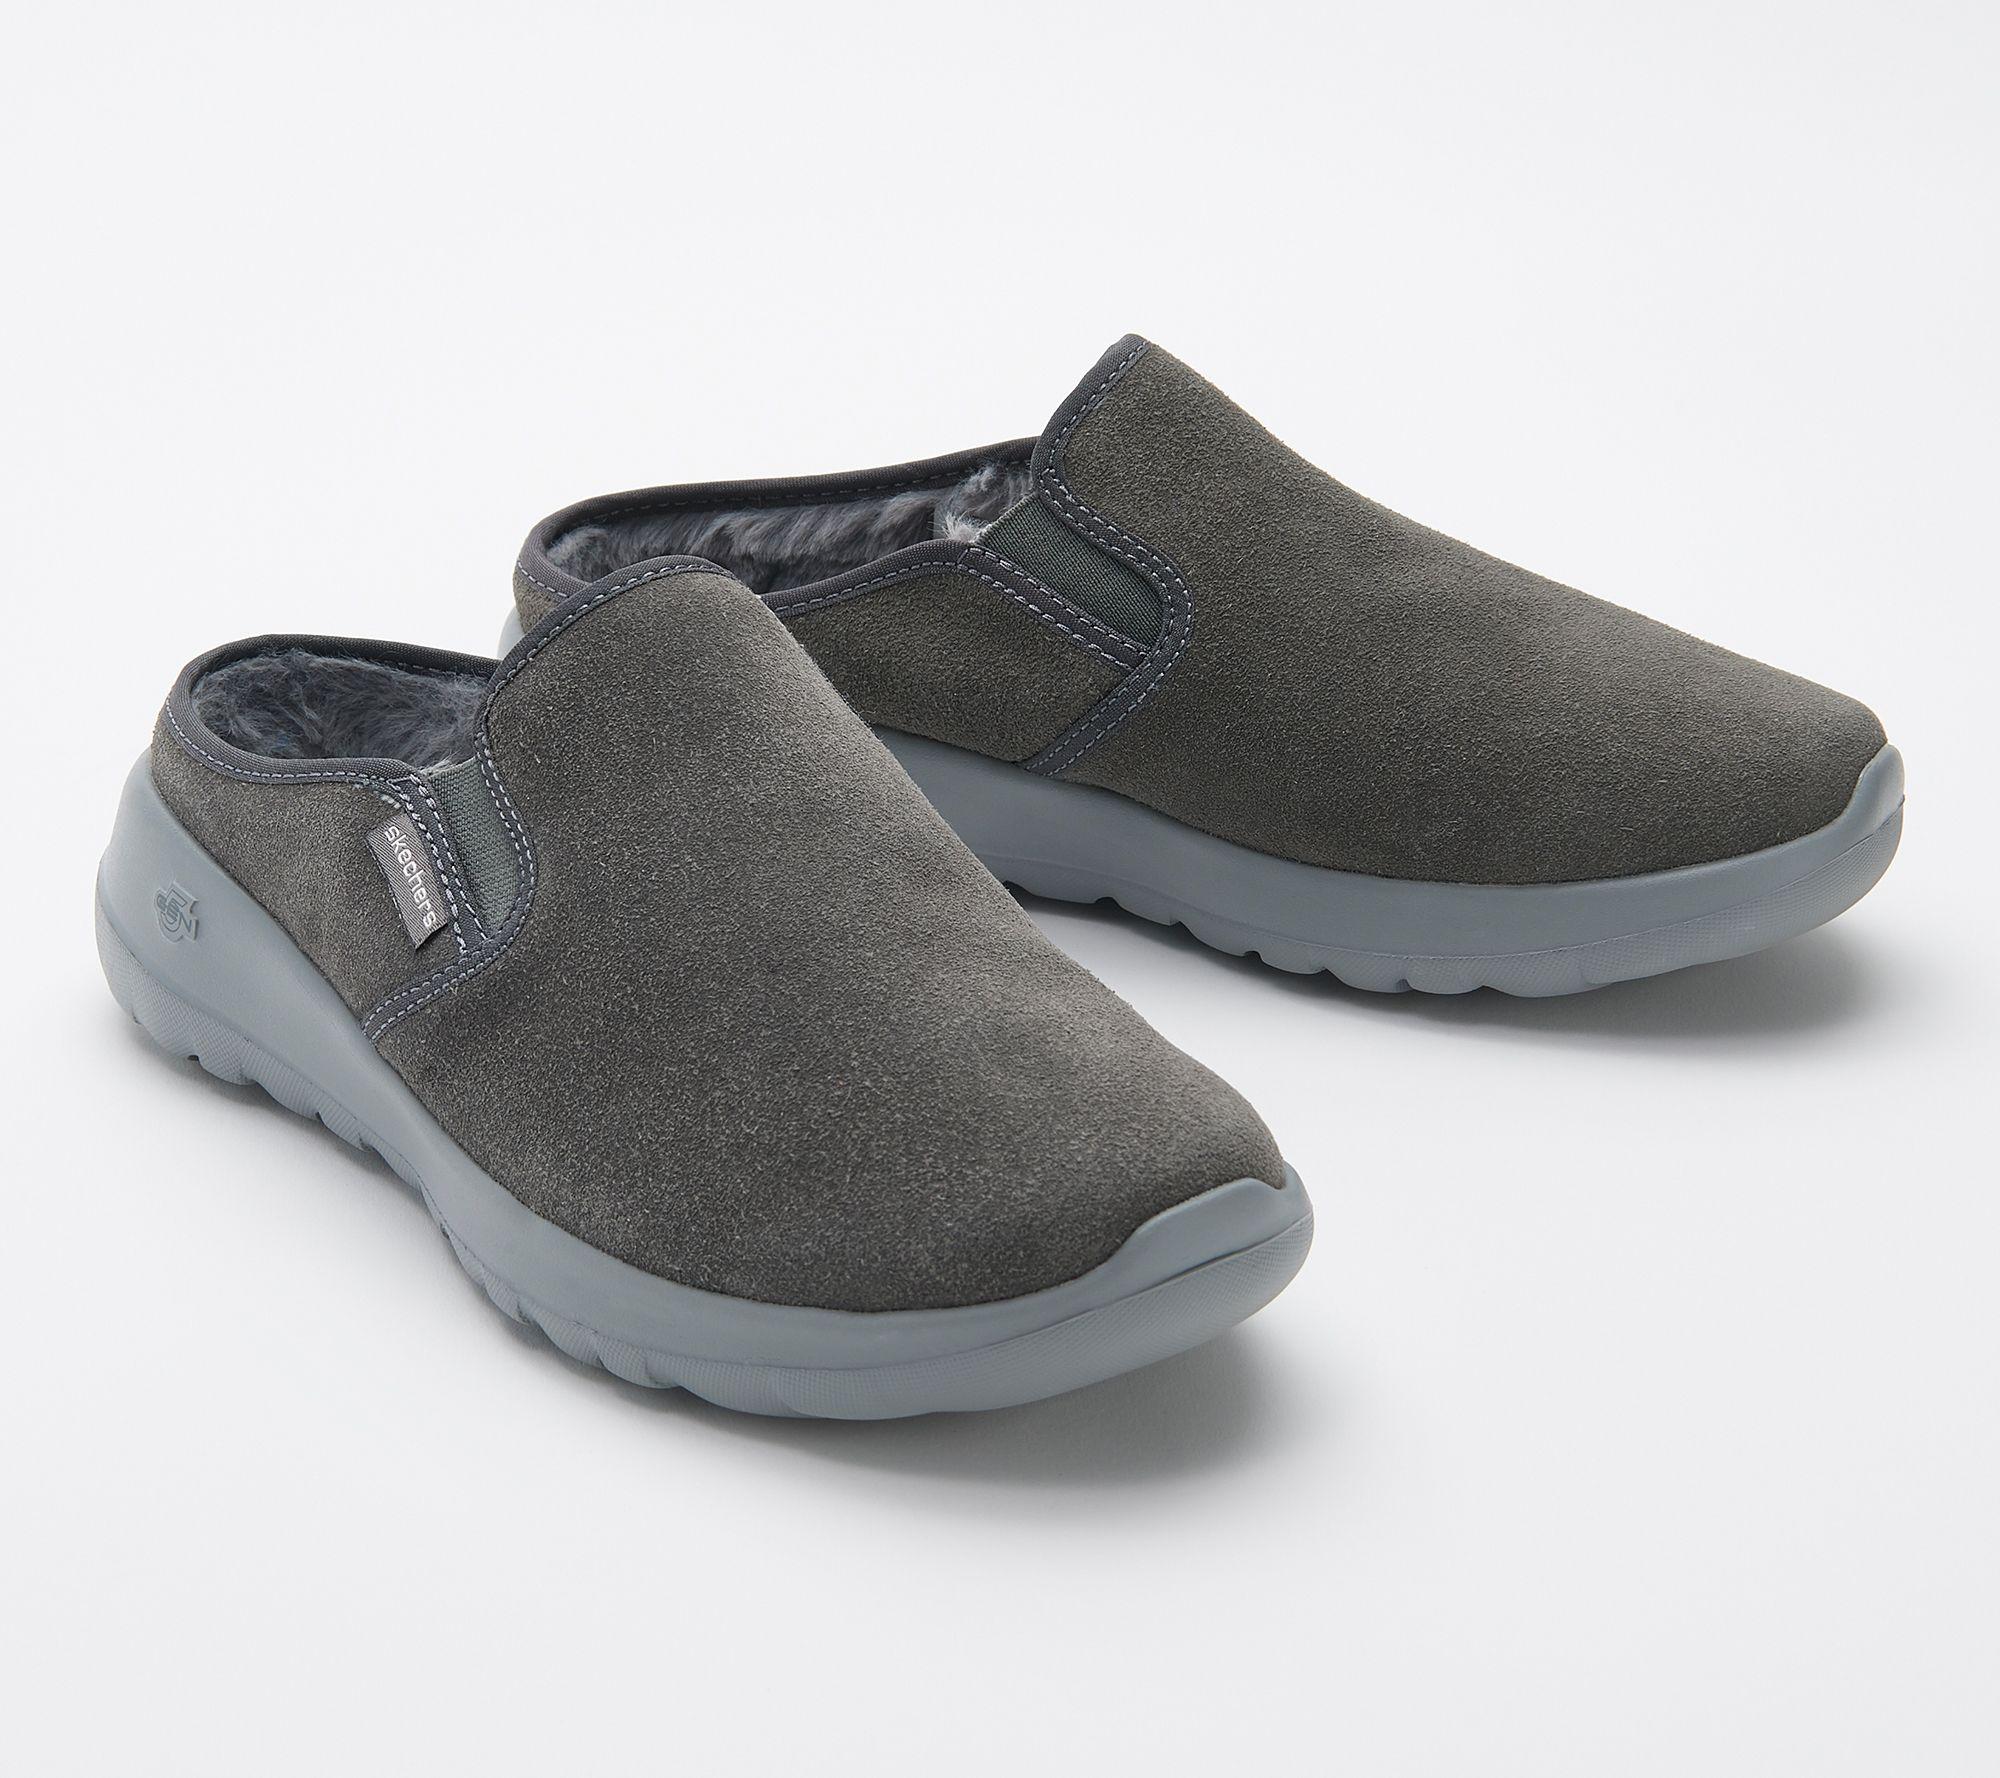 Delgado canal Químico  Skechers GOwalk Joy Water-Repellent Suede Clogs - Snuggly - QVC.com